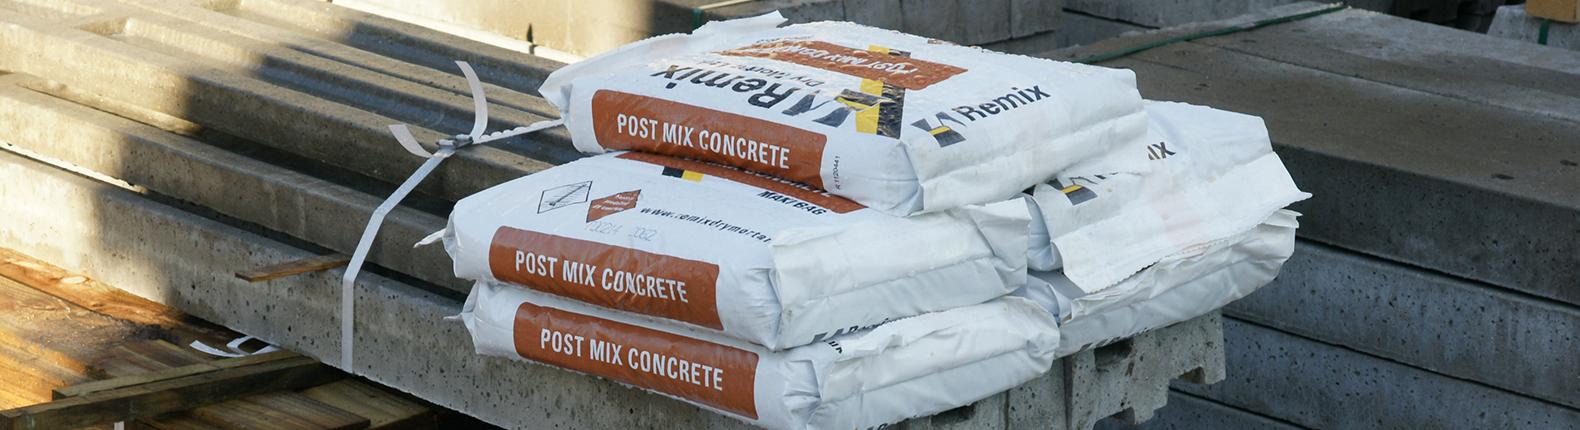 How Do I Use Post Mix Concrete? - AVS Fencing Supplies